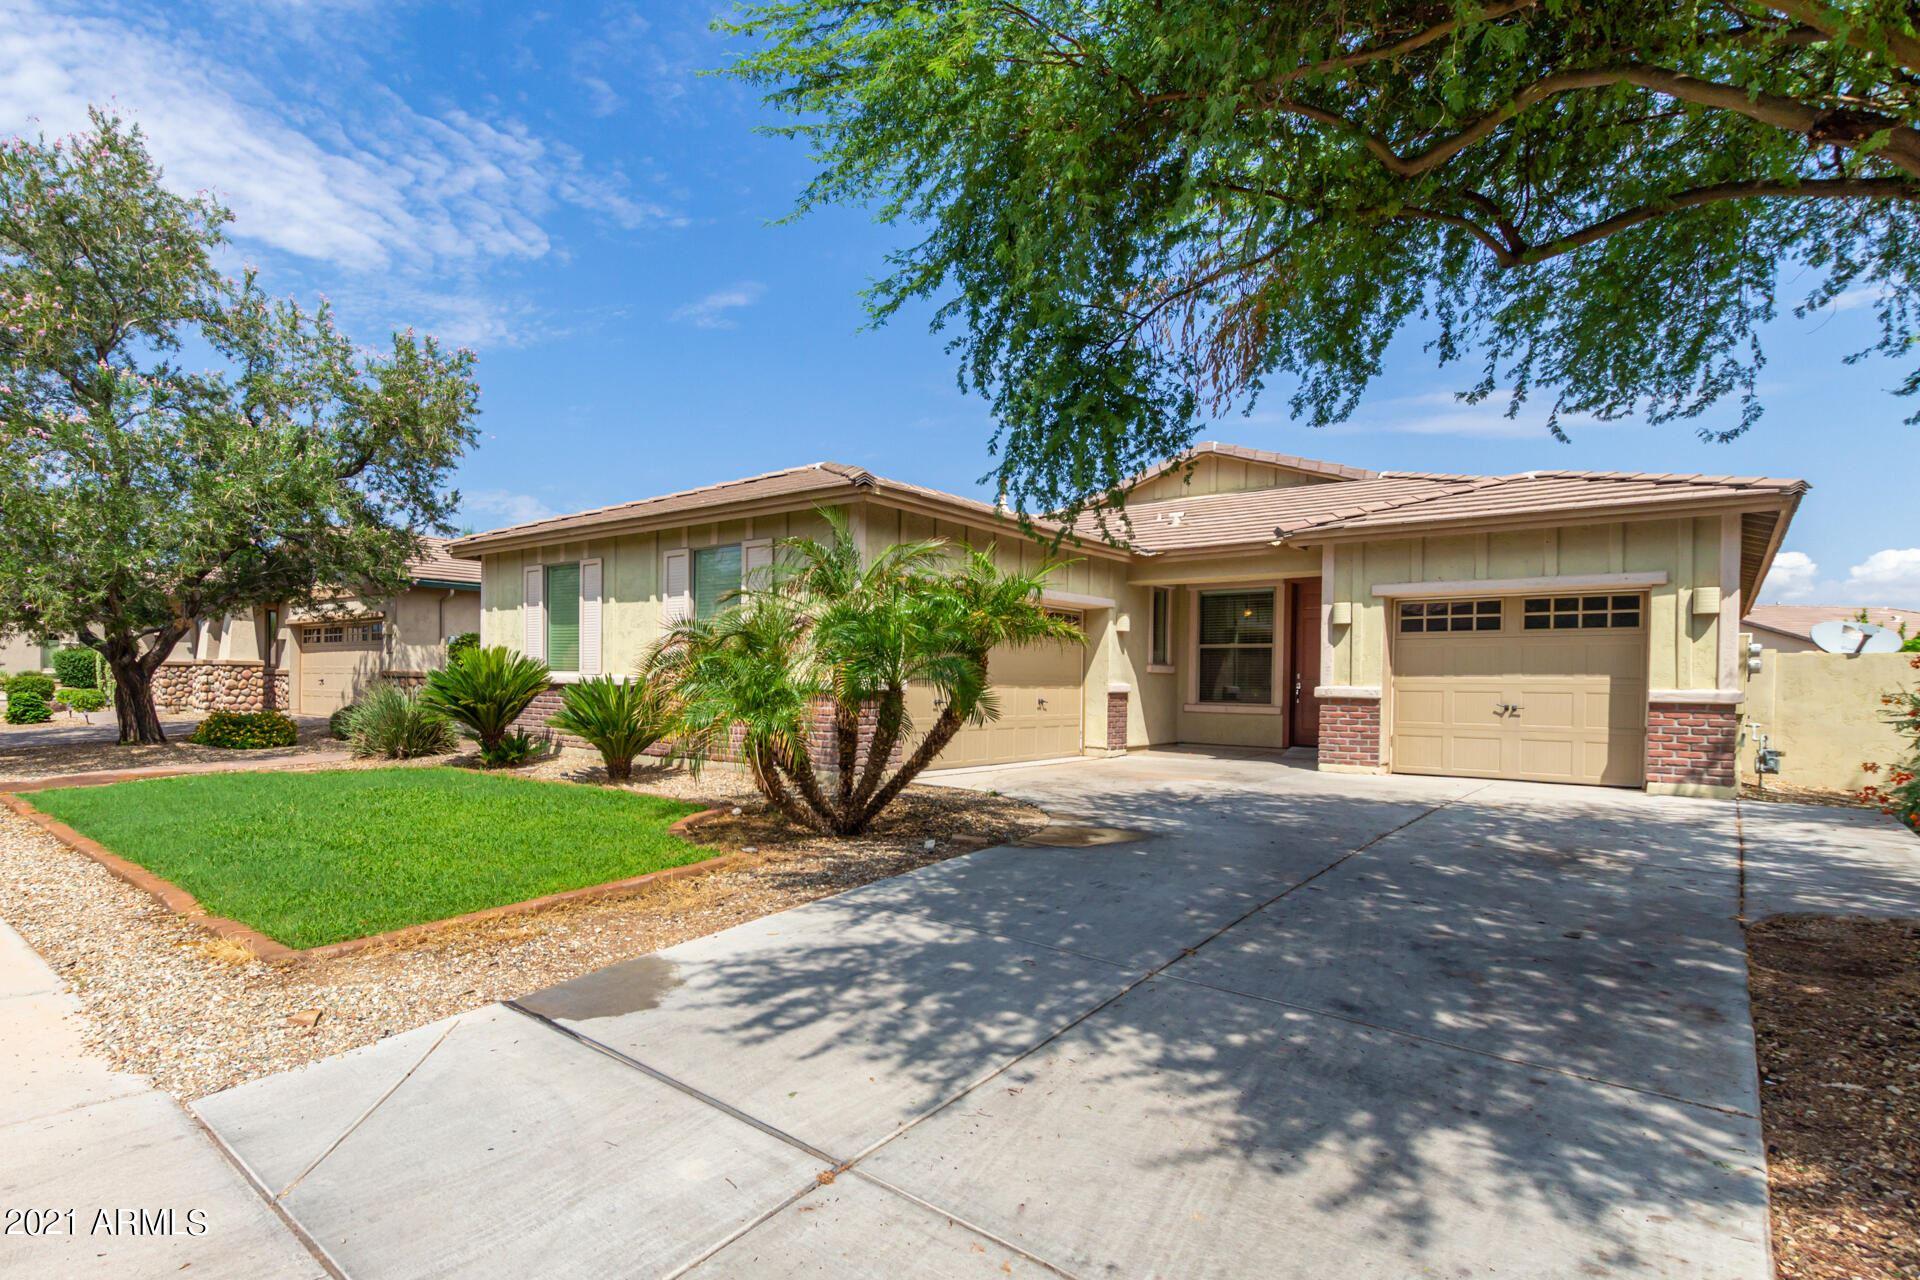 Photo of 15640 W WESTVIEW Drive, Goodyear, AZ 85395 (MLS # 6307734)